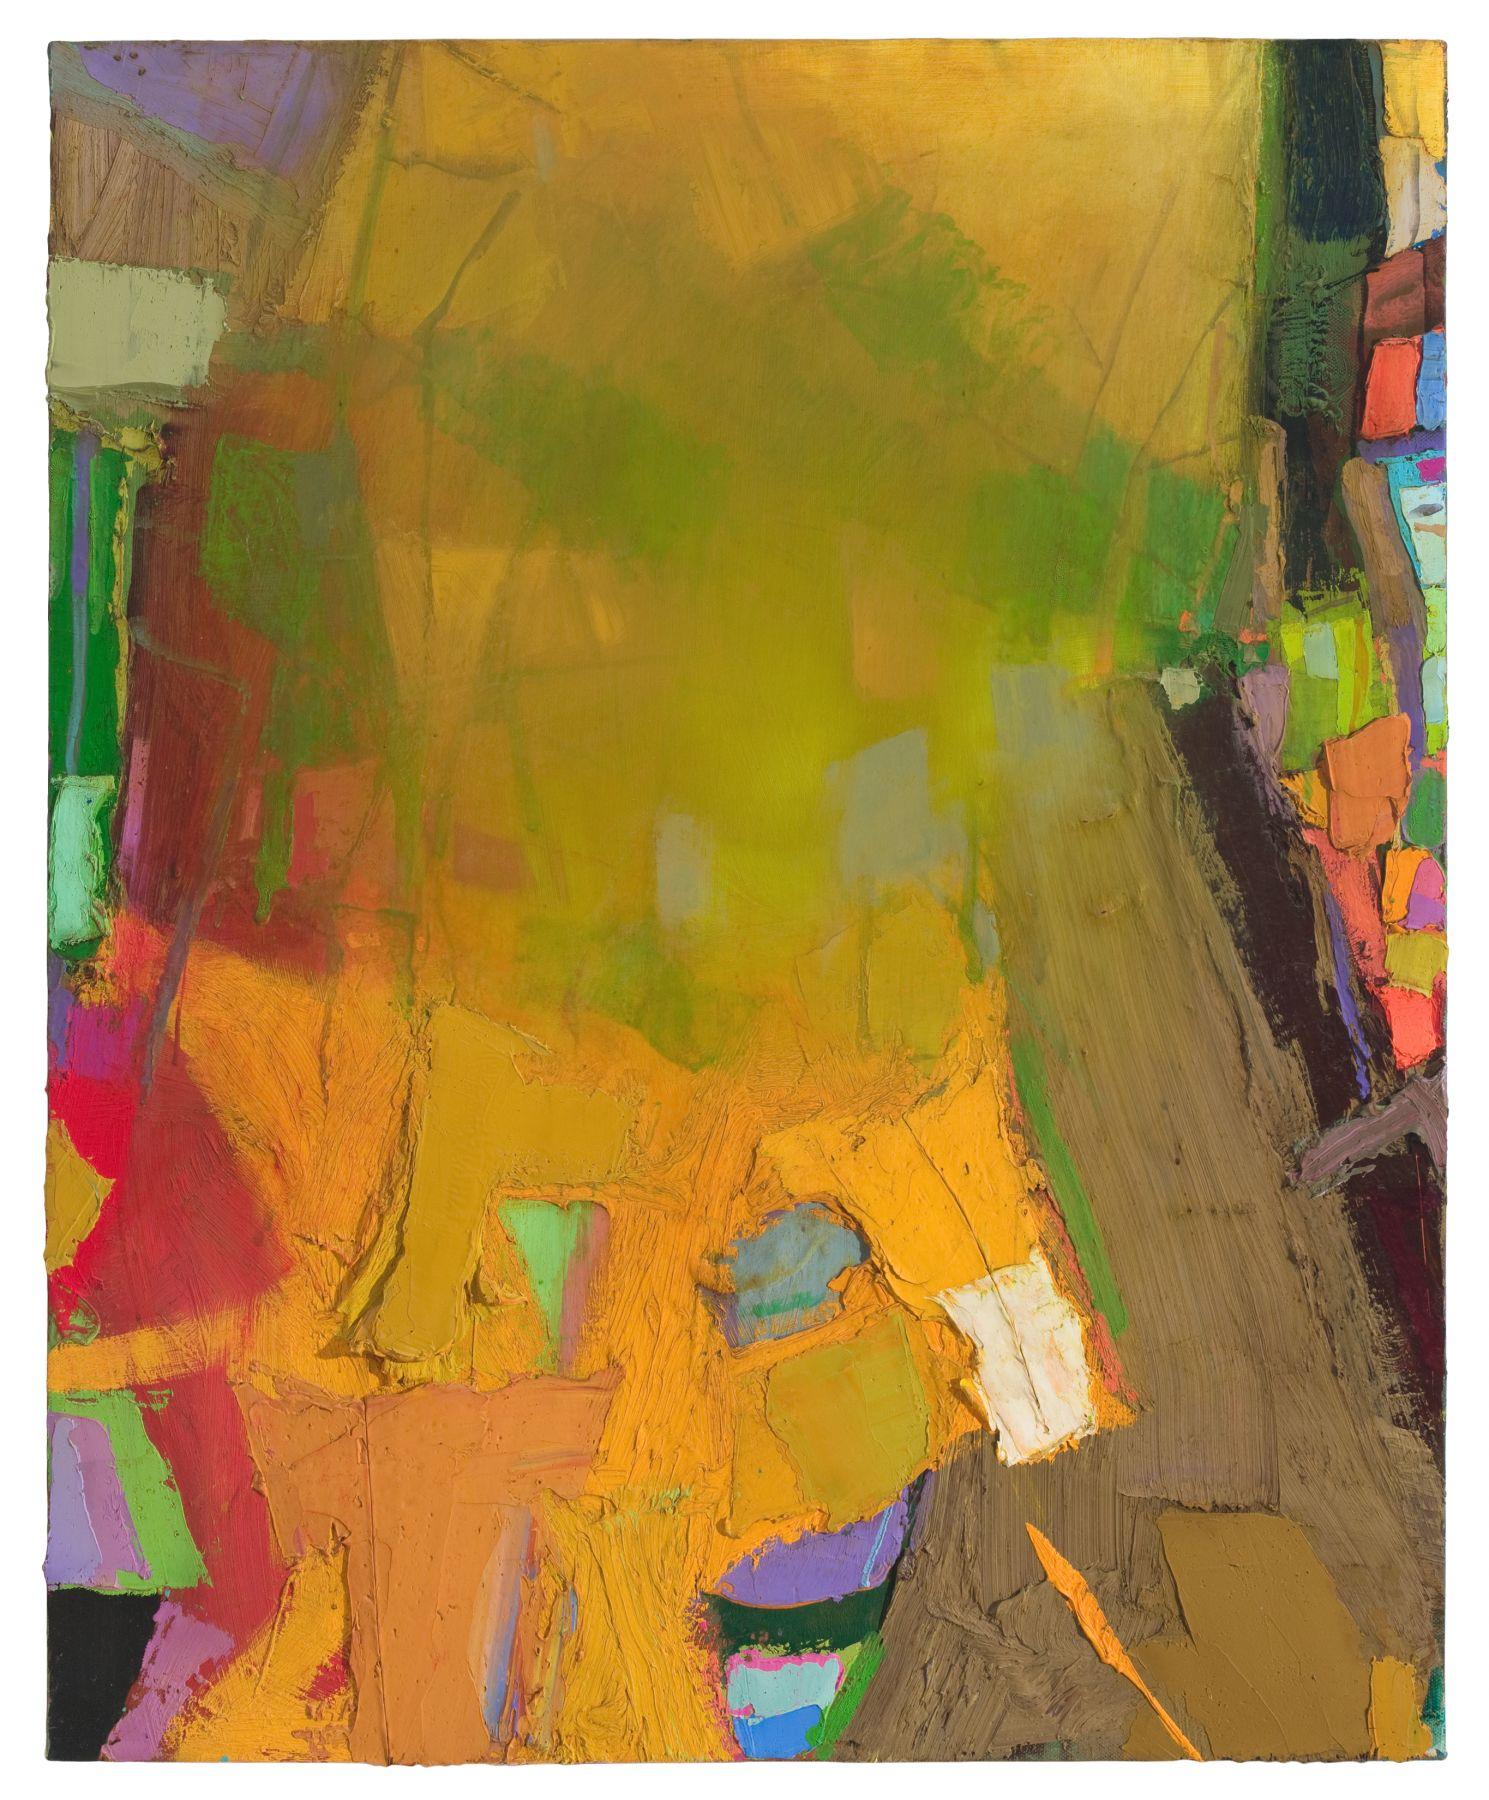 Brian Rutenberg Gainsborough Suite 3 (SOLD), 2010, oil on linen, 32 x 26 inches